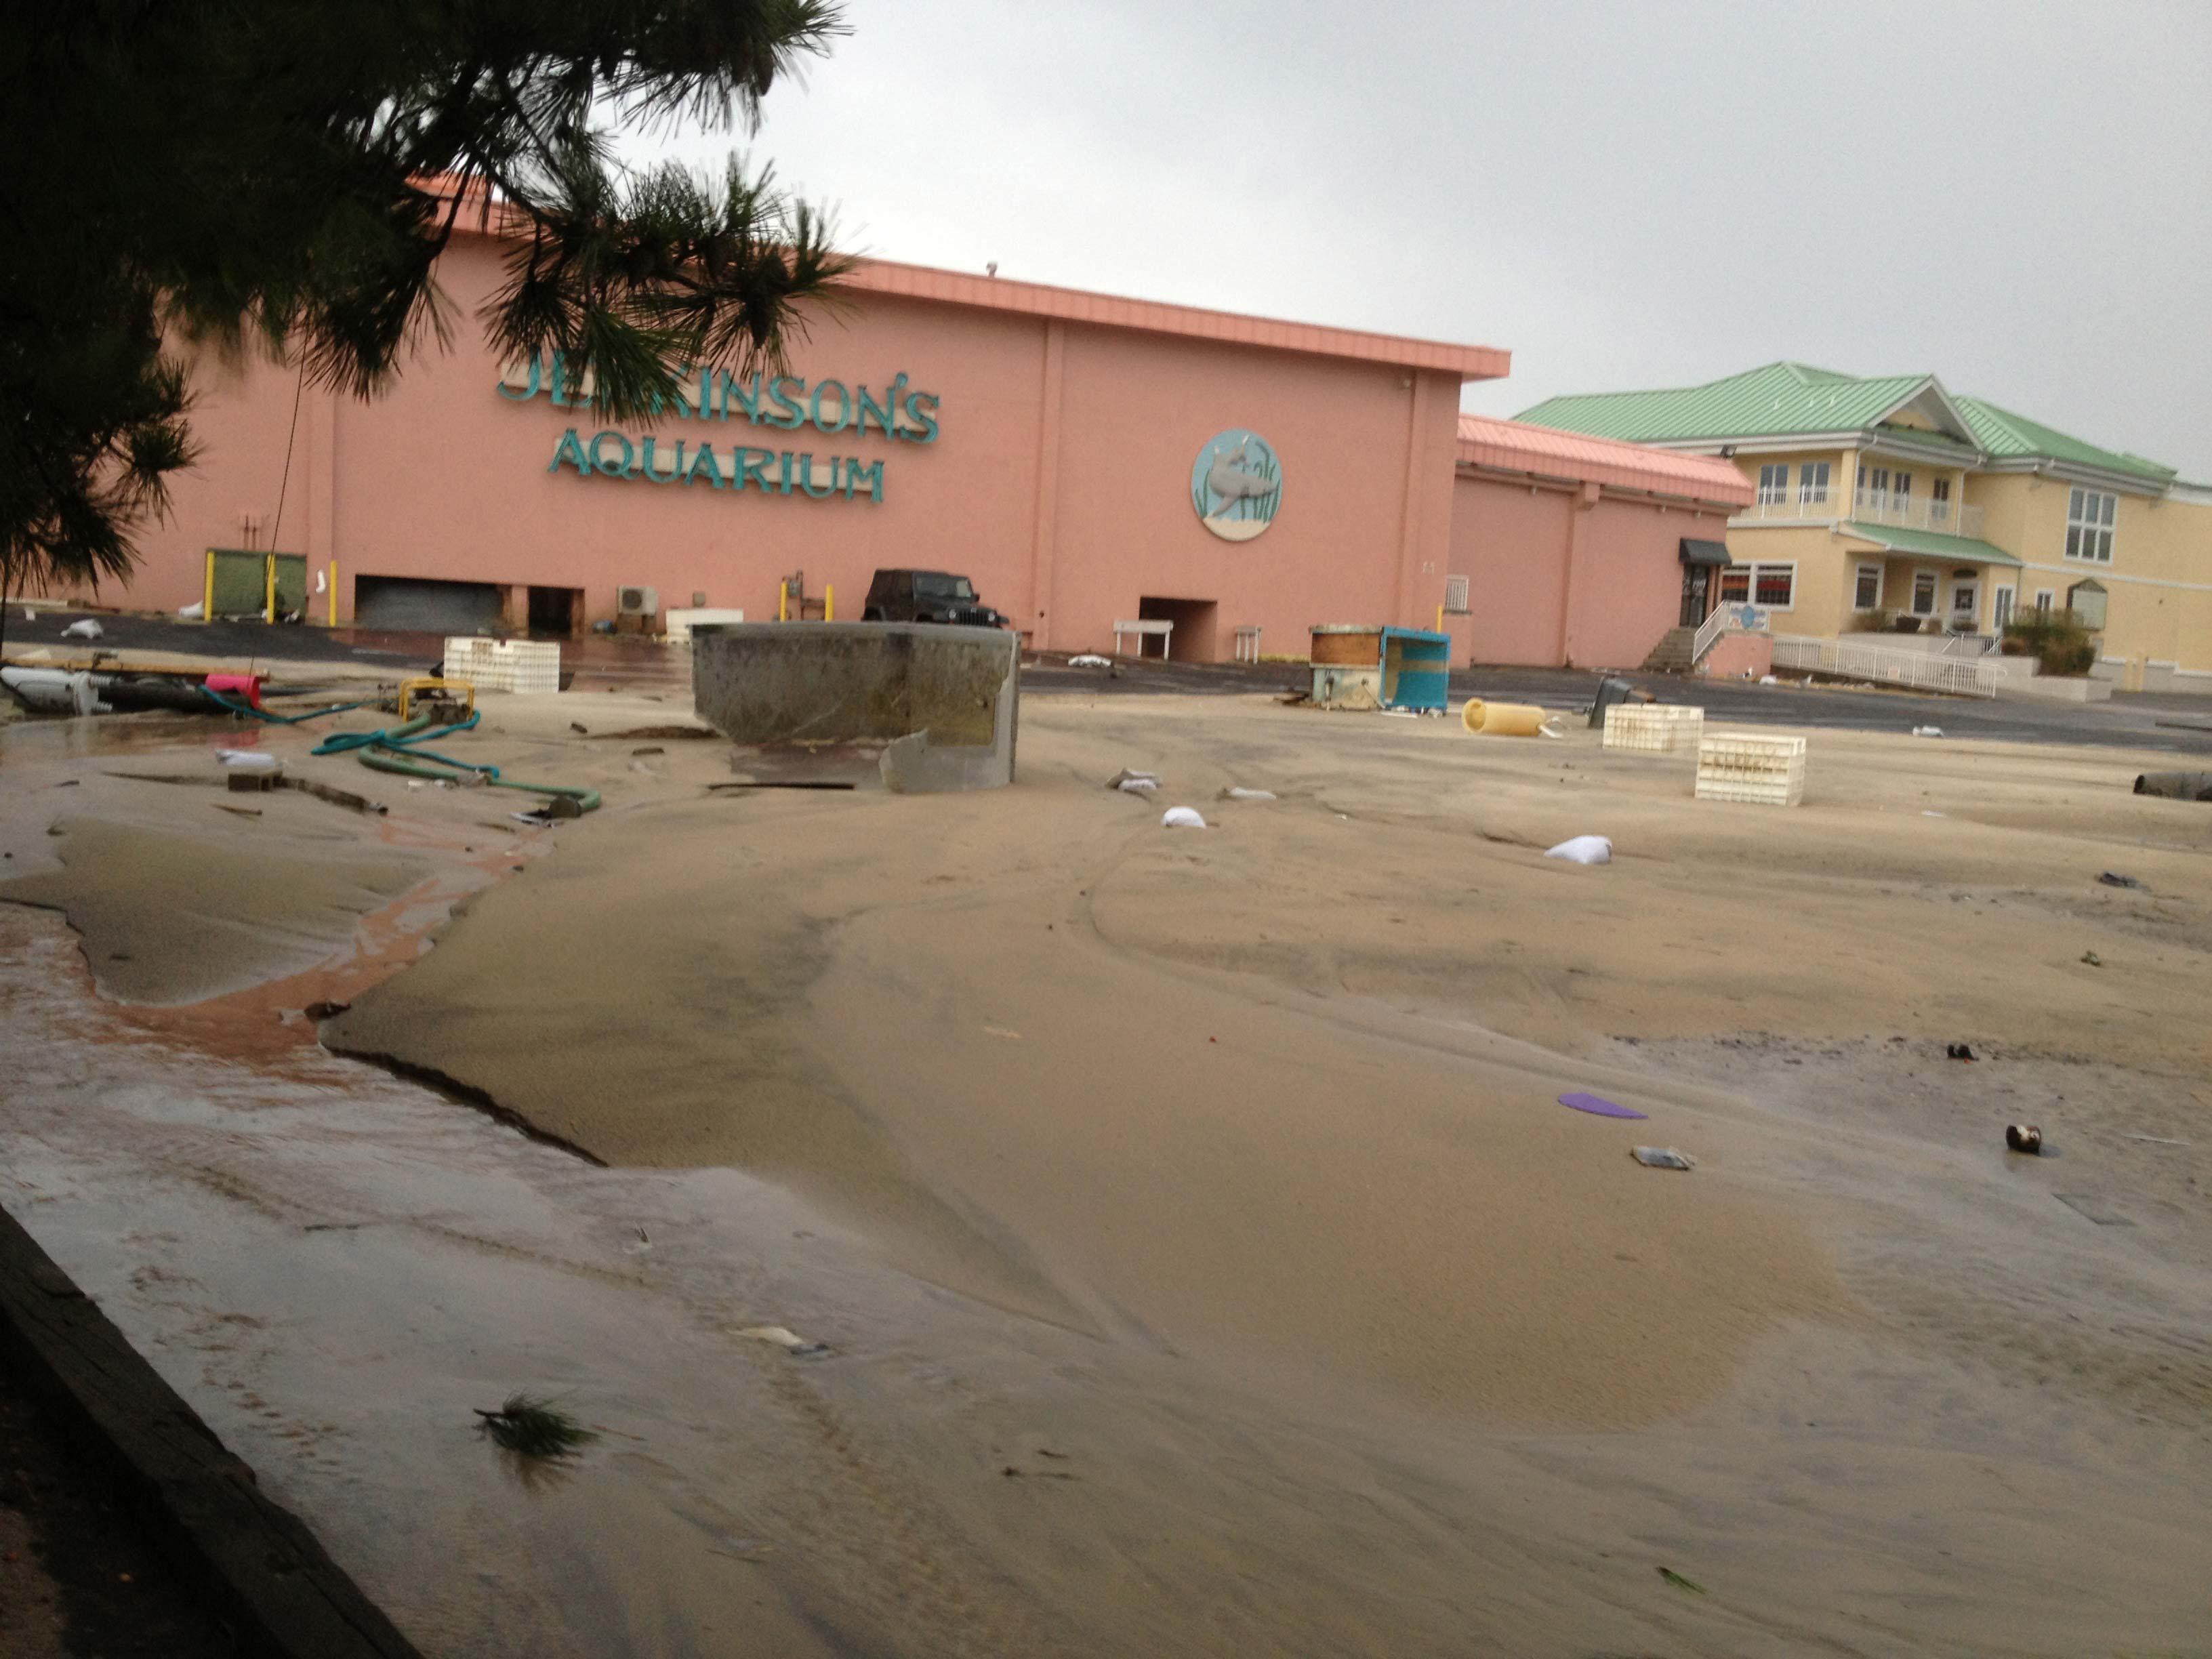 Photo of Jenkinson's Aquarium after Hurricane Sandy